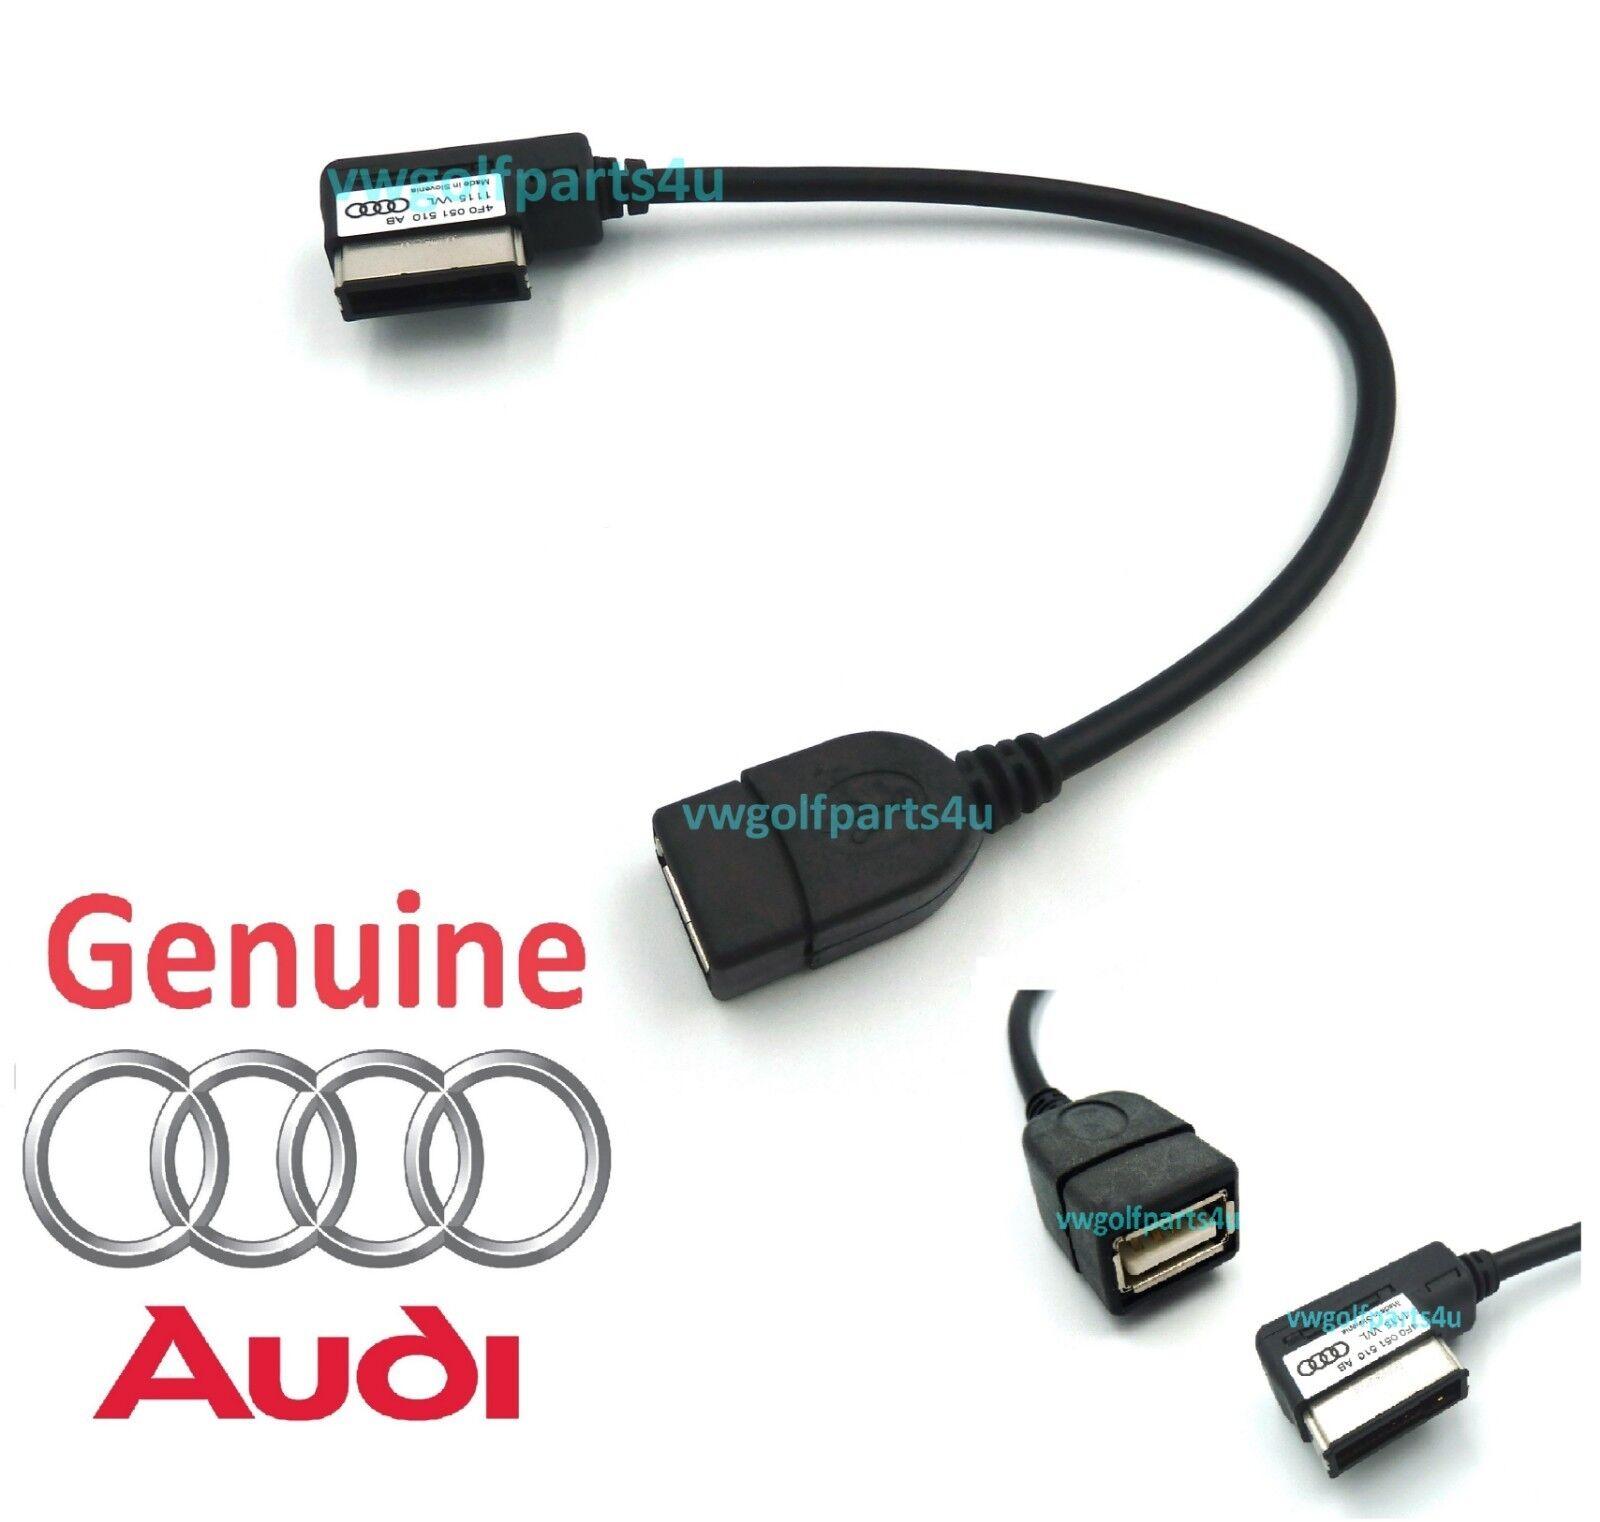 Car Parts - Genuine Audi AMI Lead music iPod MP3 Memory Stick Cable to USB 4F0051510AB